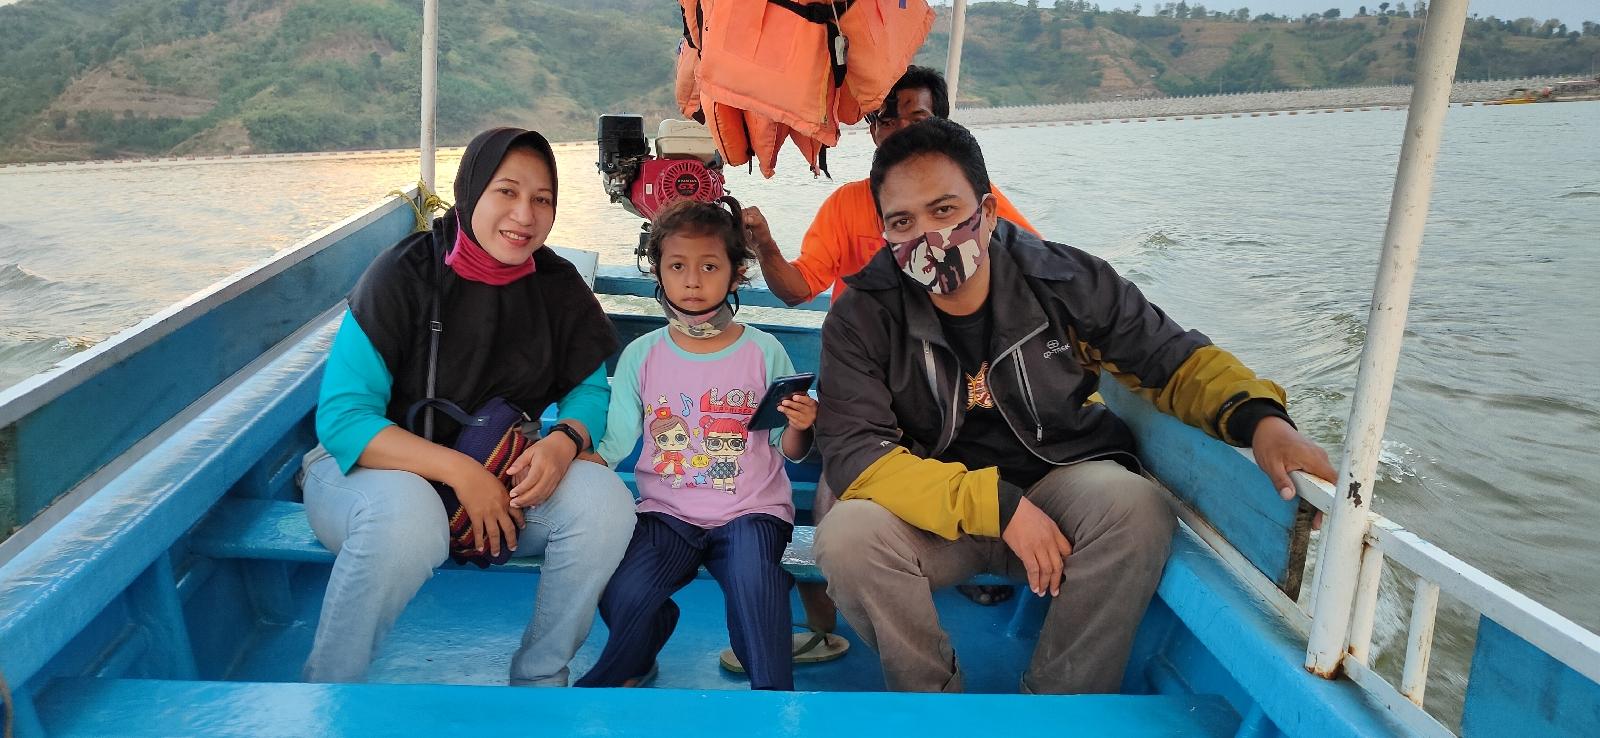 Wisata perahu waduk logung